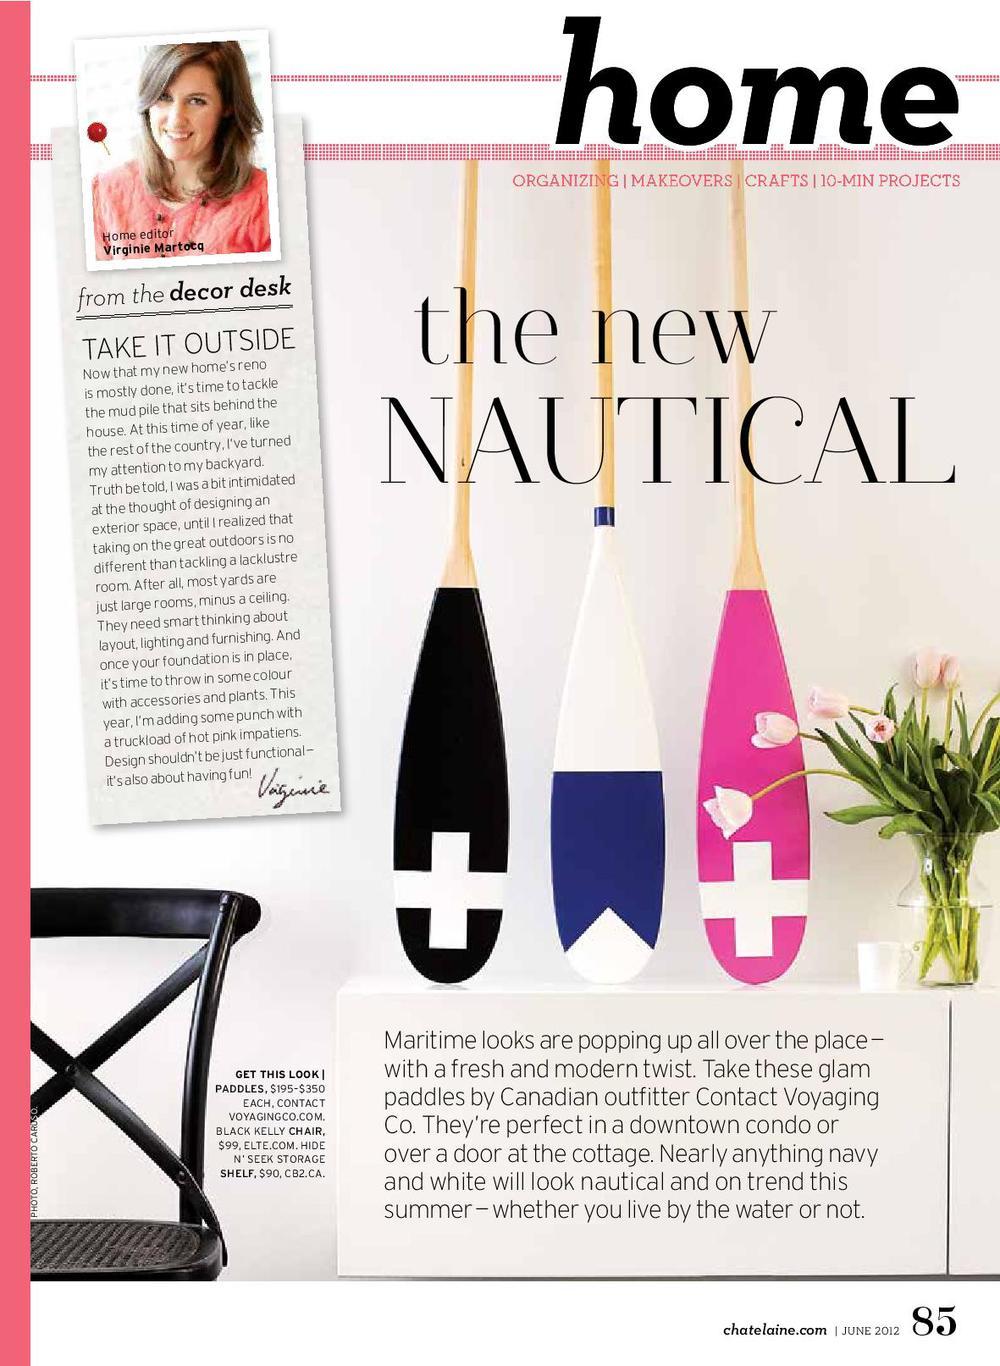 nautical june 2012-page-001.jpg